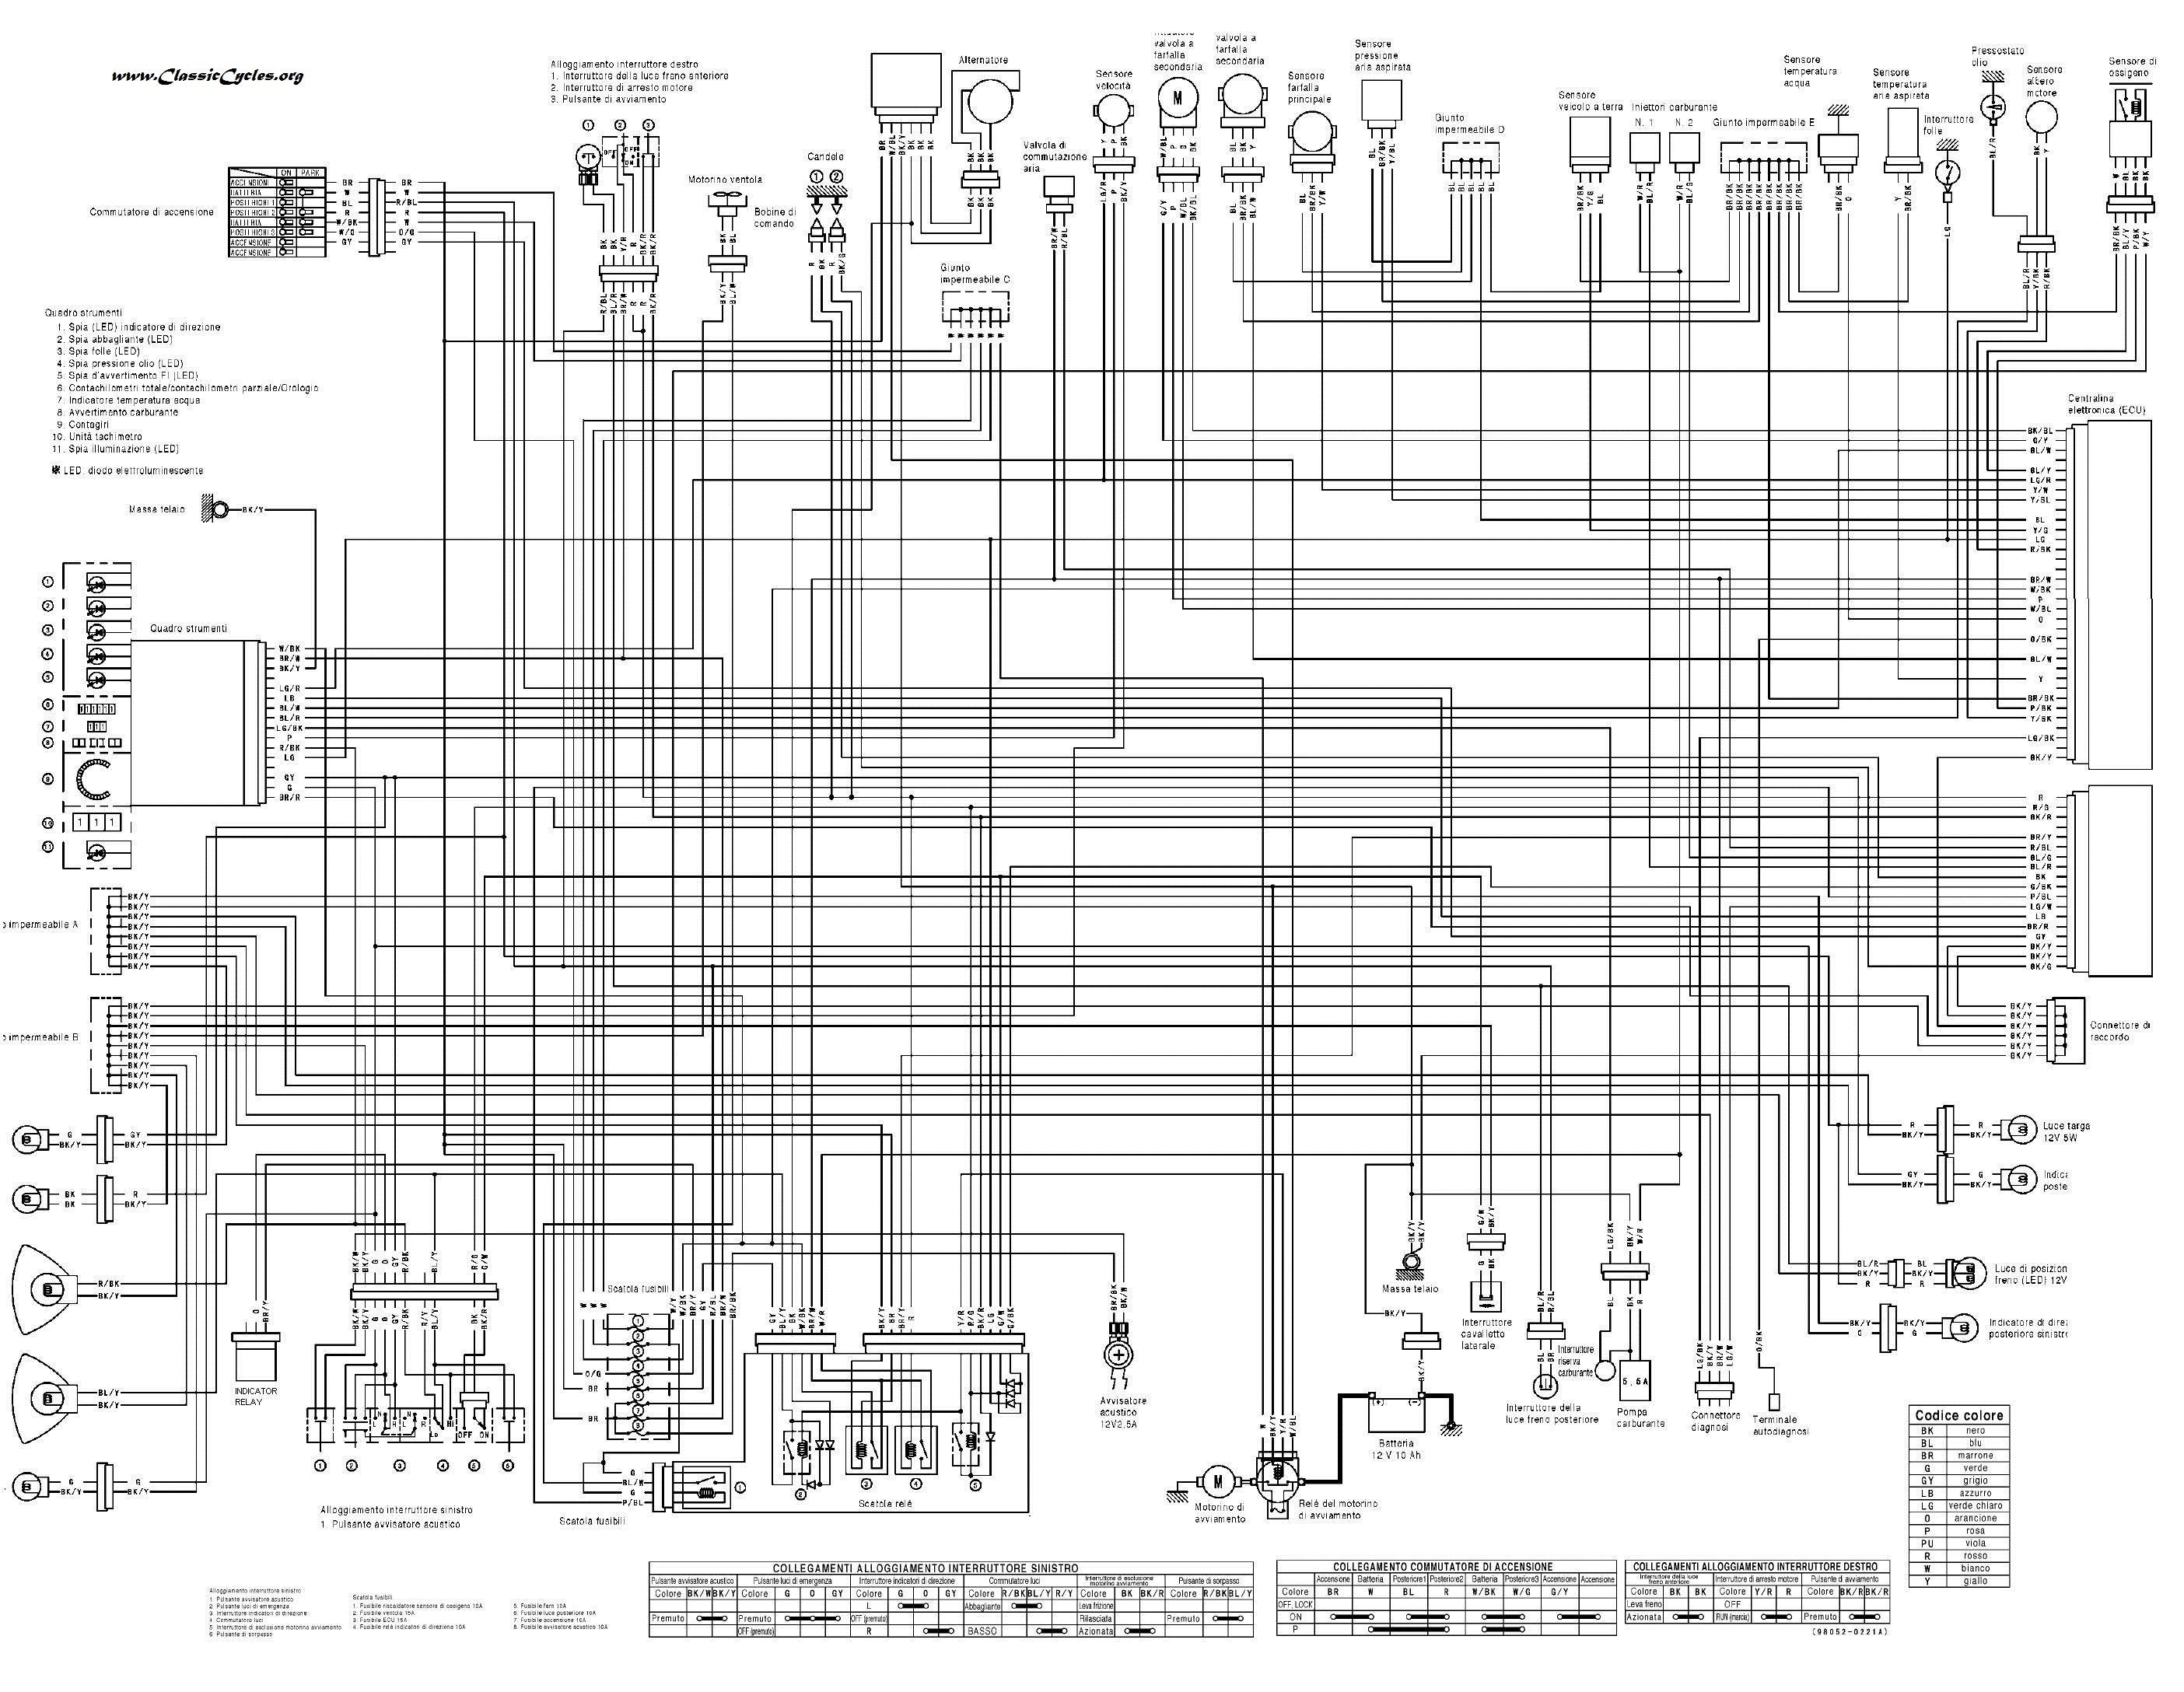 Wiring Harness Diagram - Data Wiring Diagram Schematic - Wiring Harness Diagram